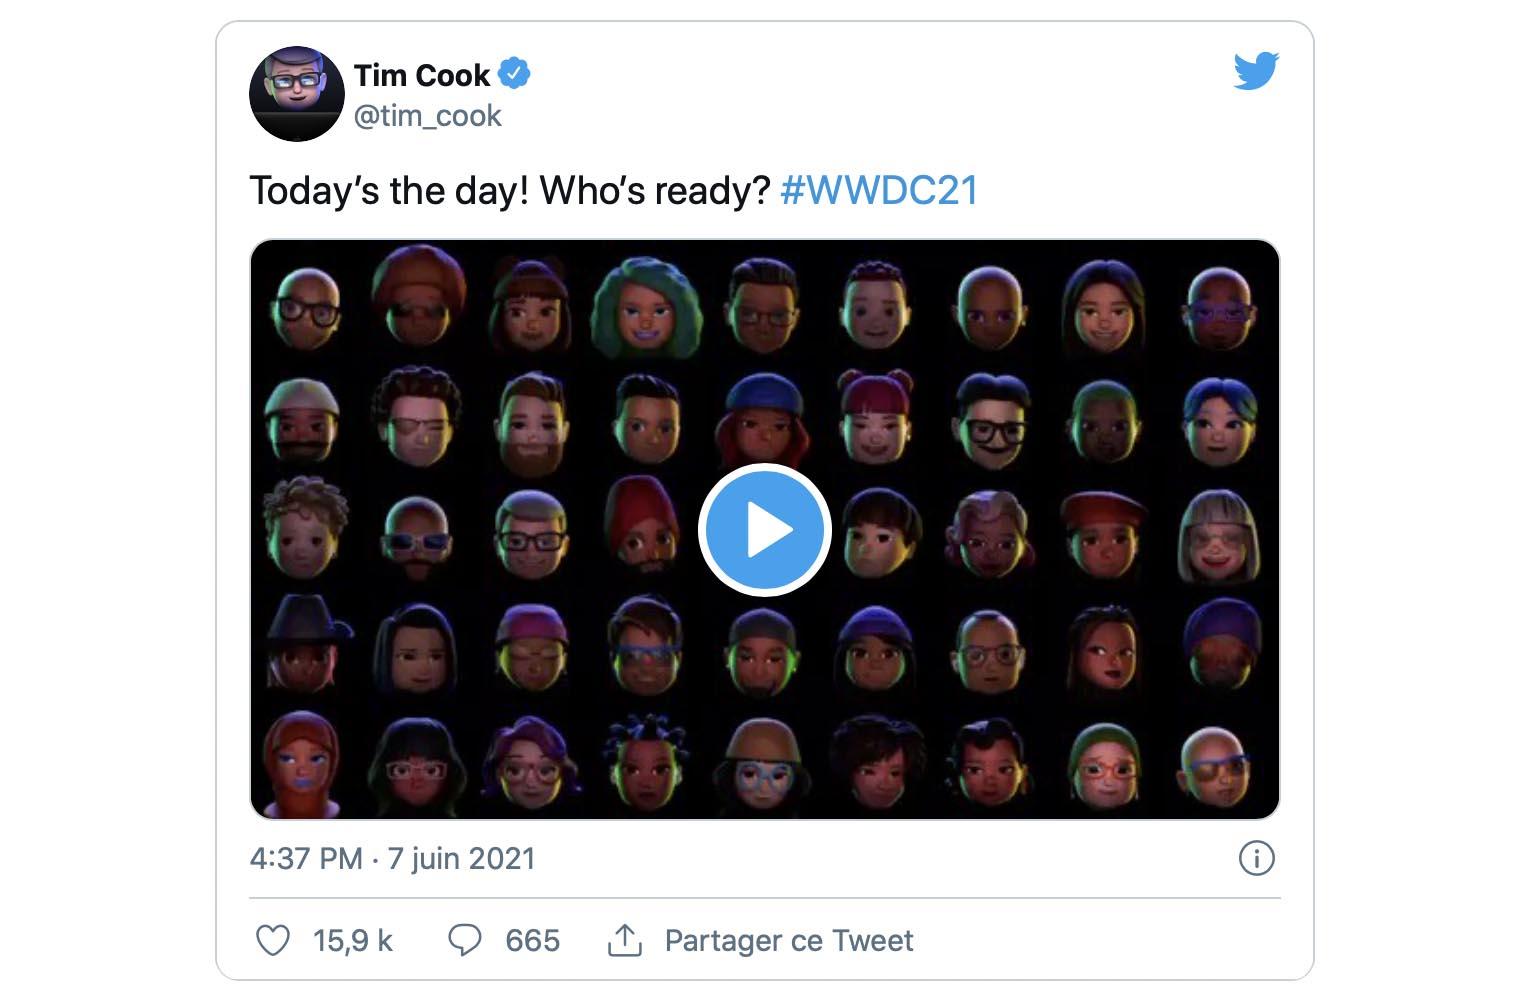 WWDC 2021 tweet Tim Cook